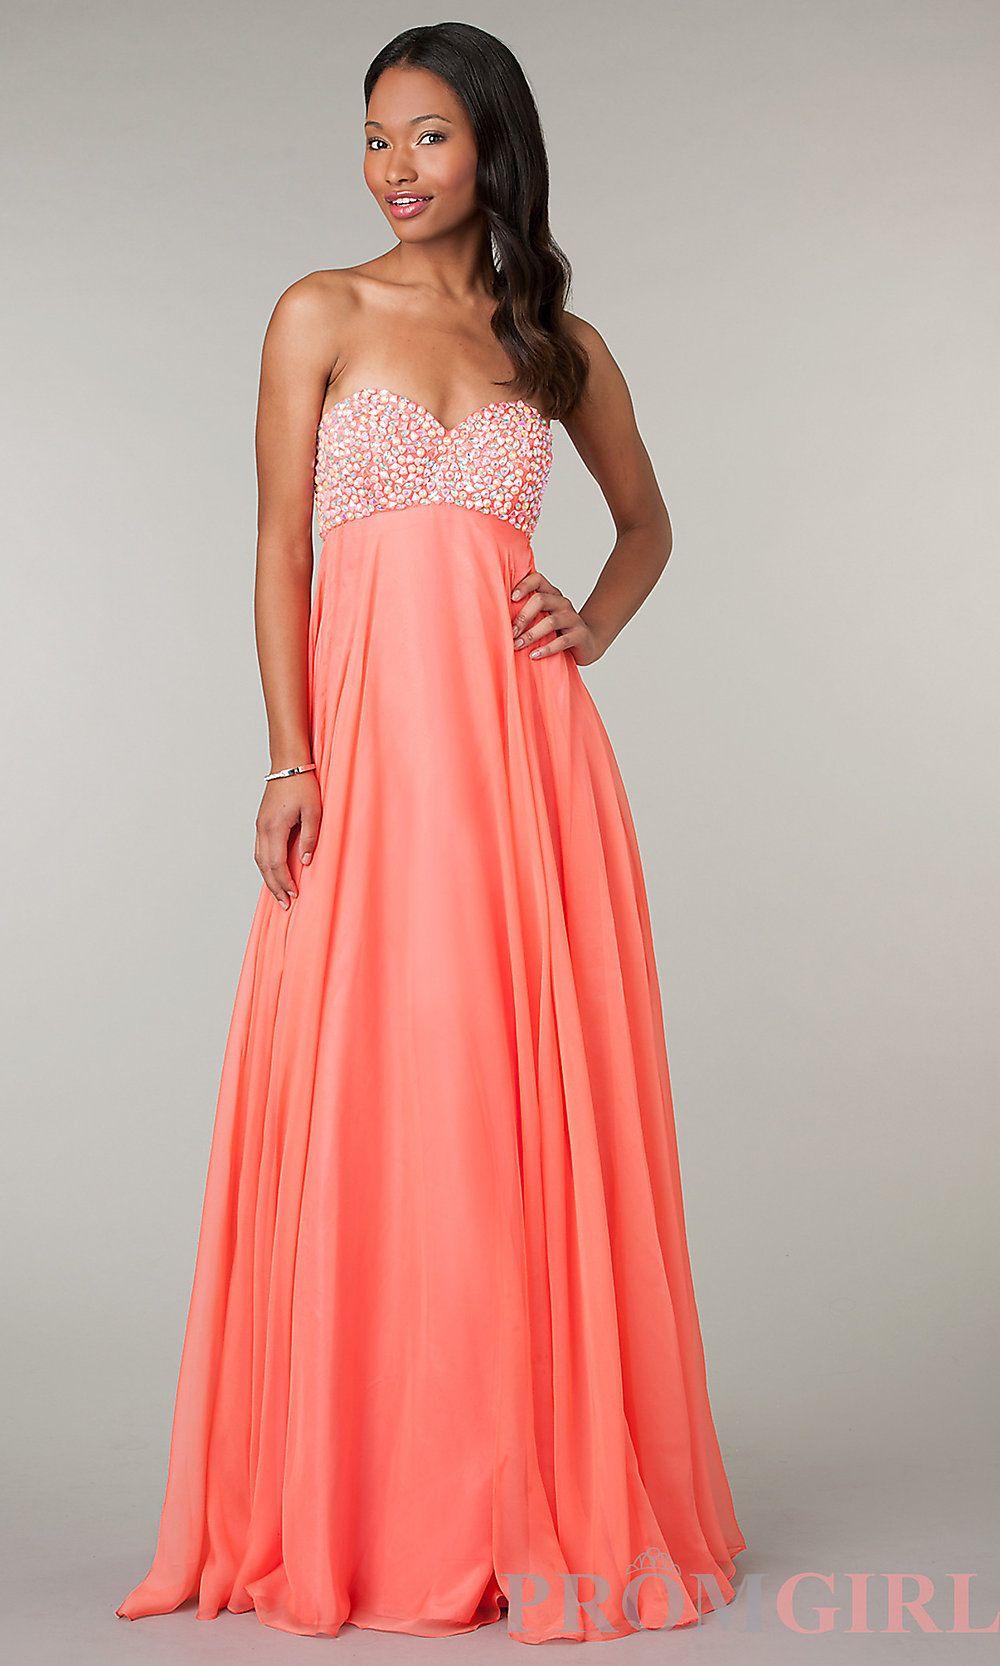 Empire waist floor length strapless sweetheart dress formality